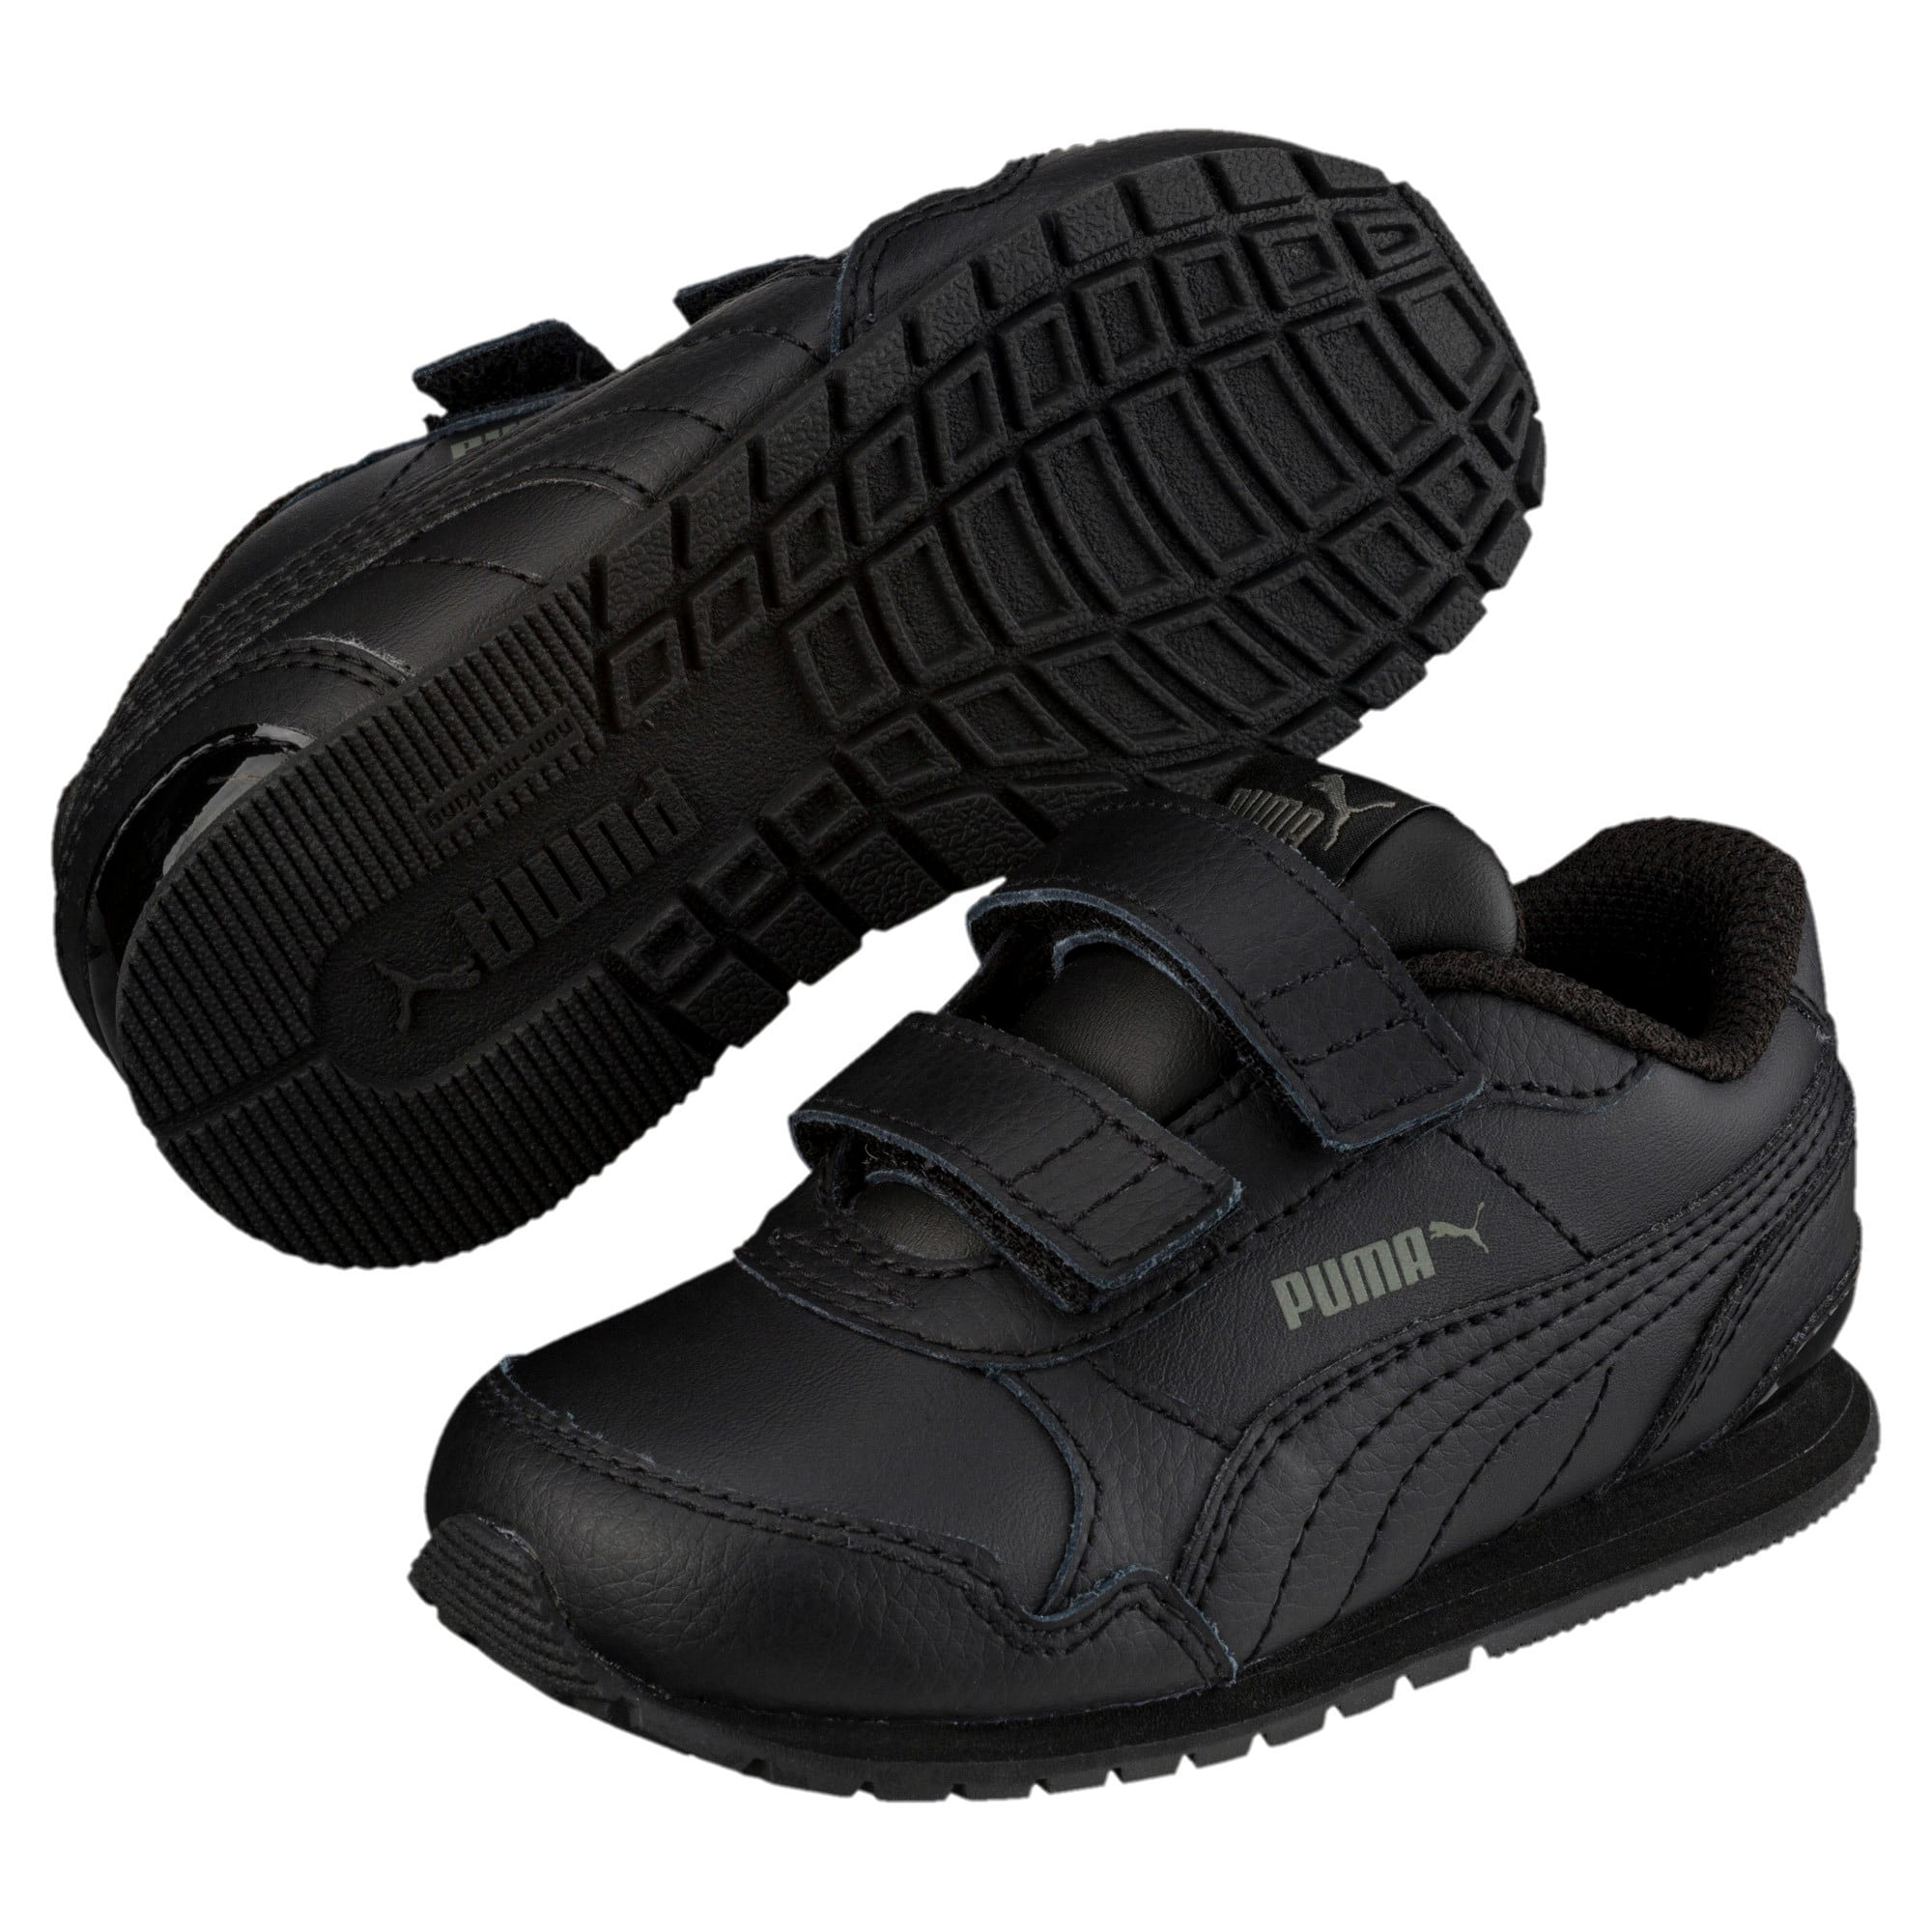 Thumbnail 2 of ST Runner v2 AC Little Kids' Shoes, Puma Black-Dark Shadow, medium